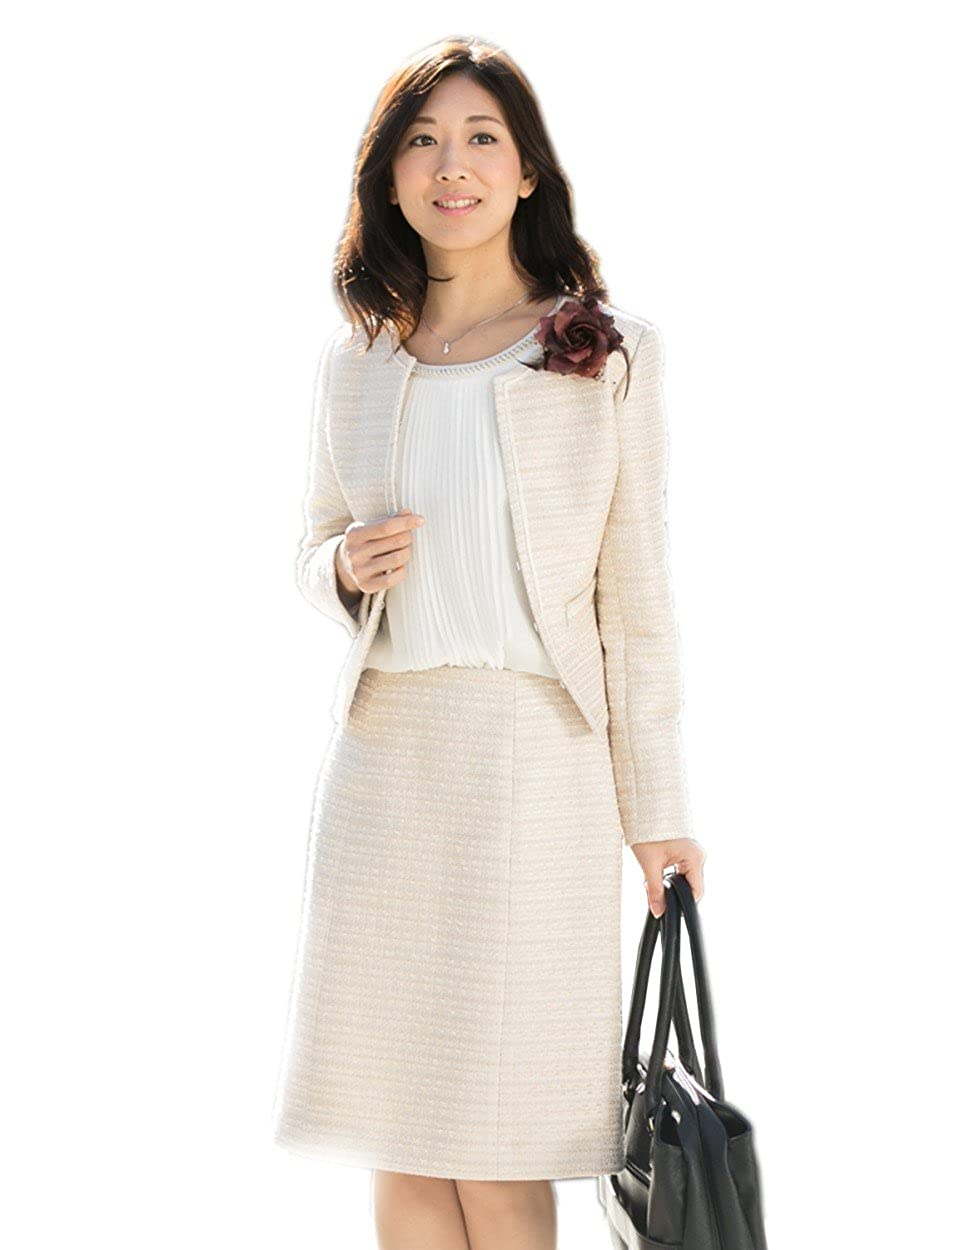 833cb166f149a  5~17号 フェアモント ツイードスーツ 入学式 入園式 ママ 母親 レディース